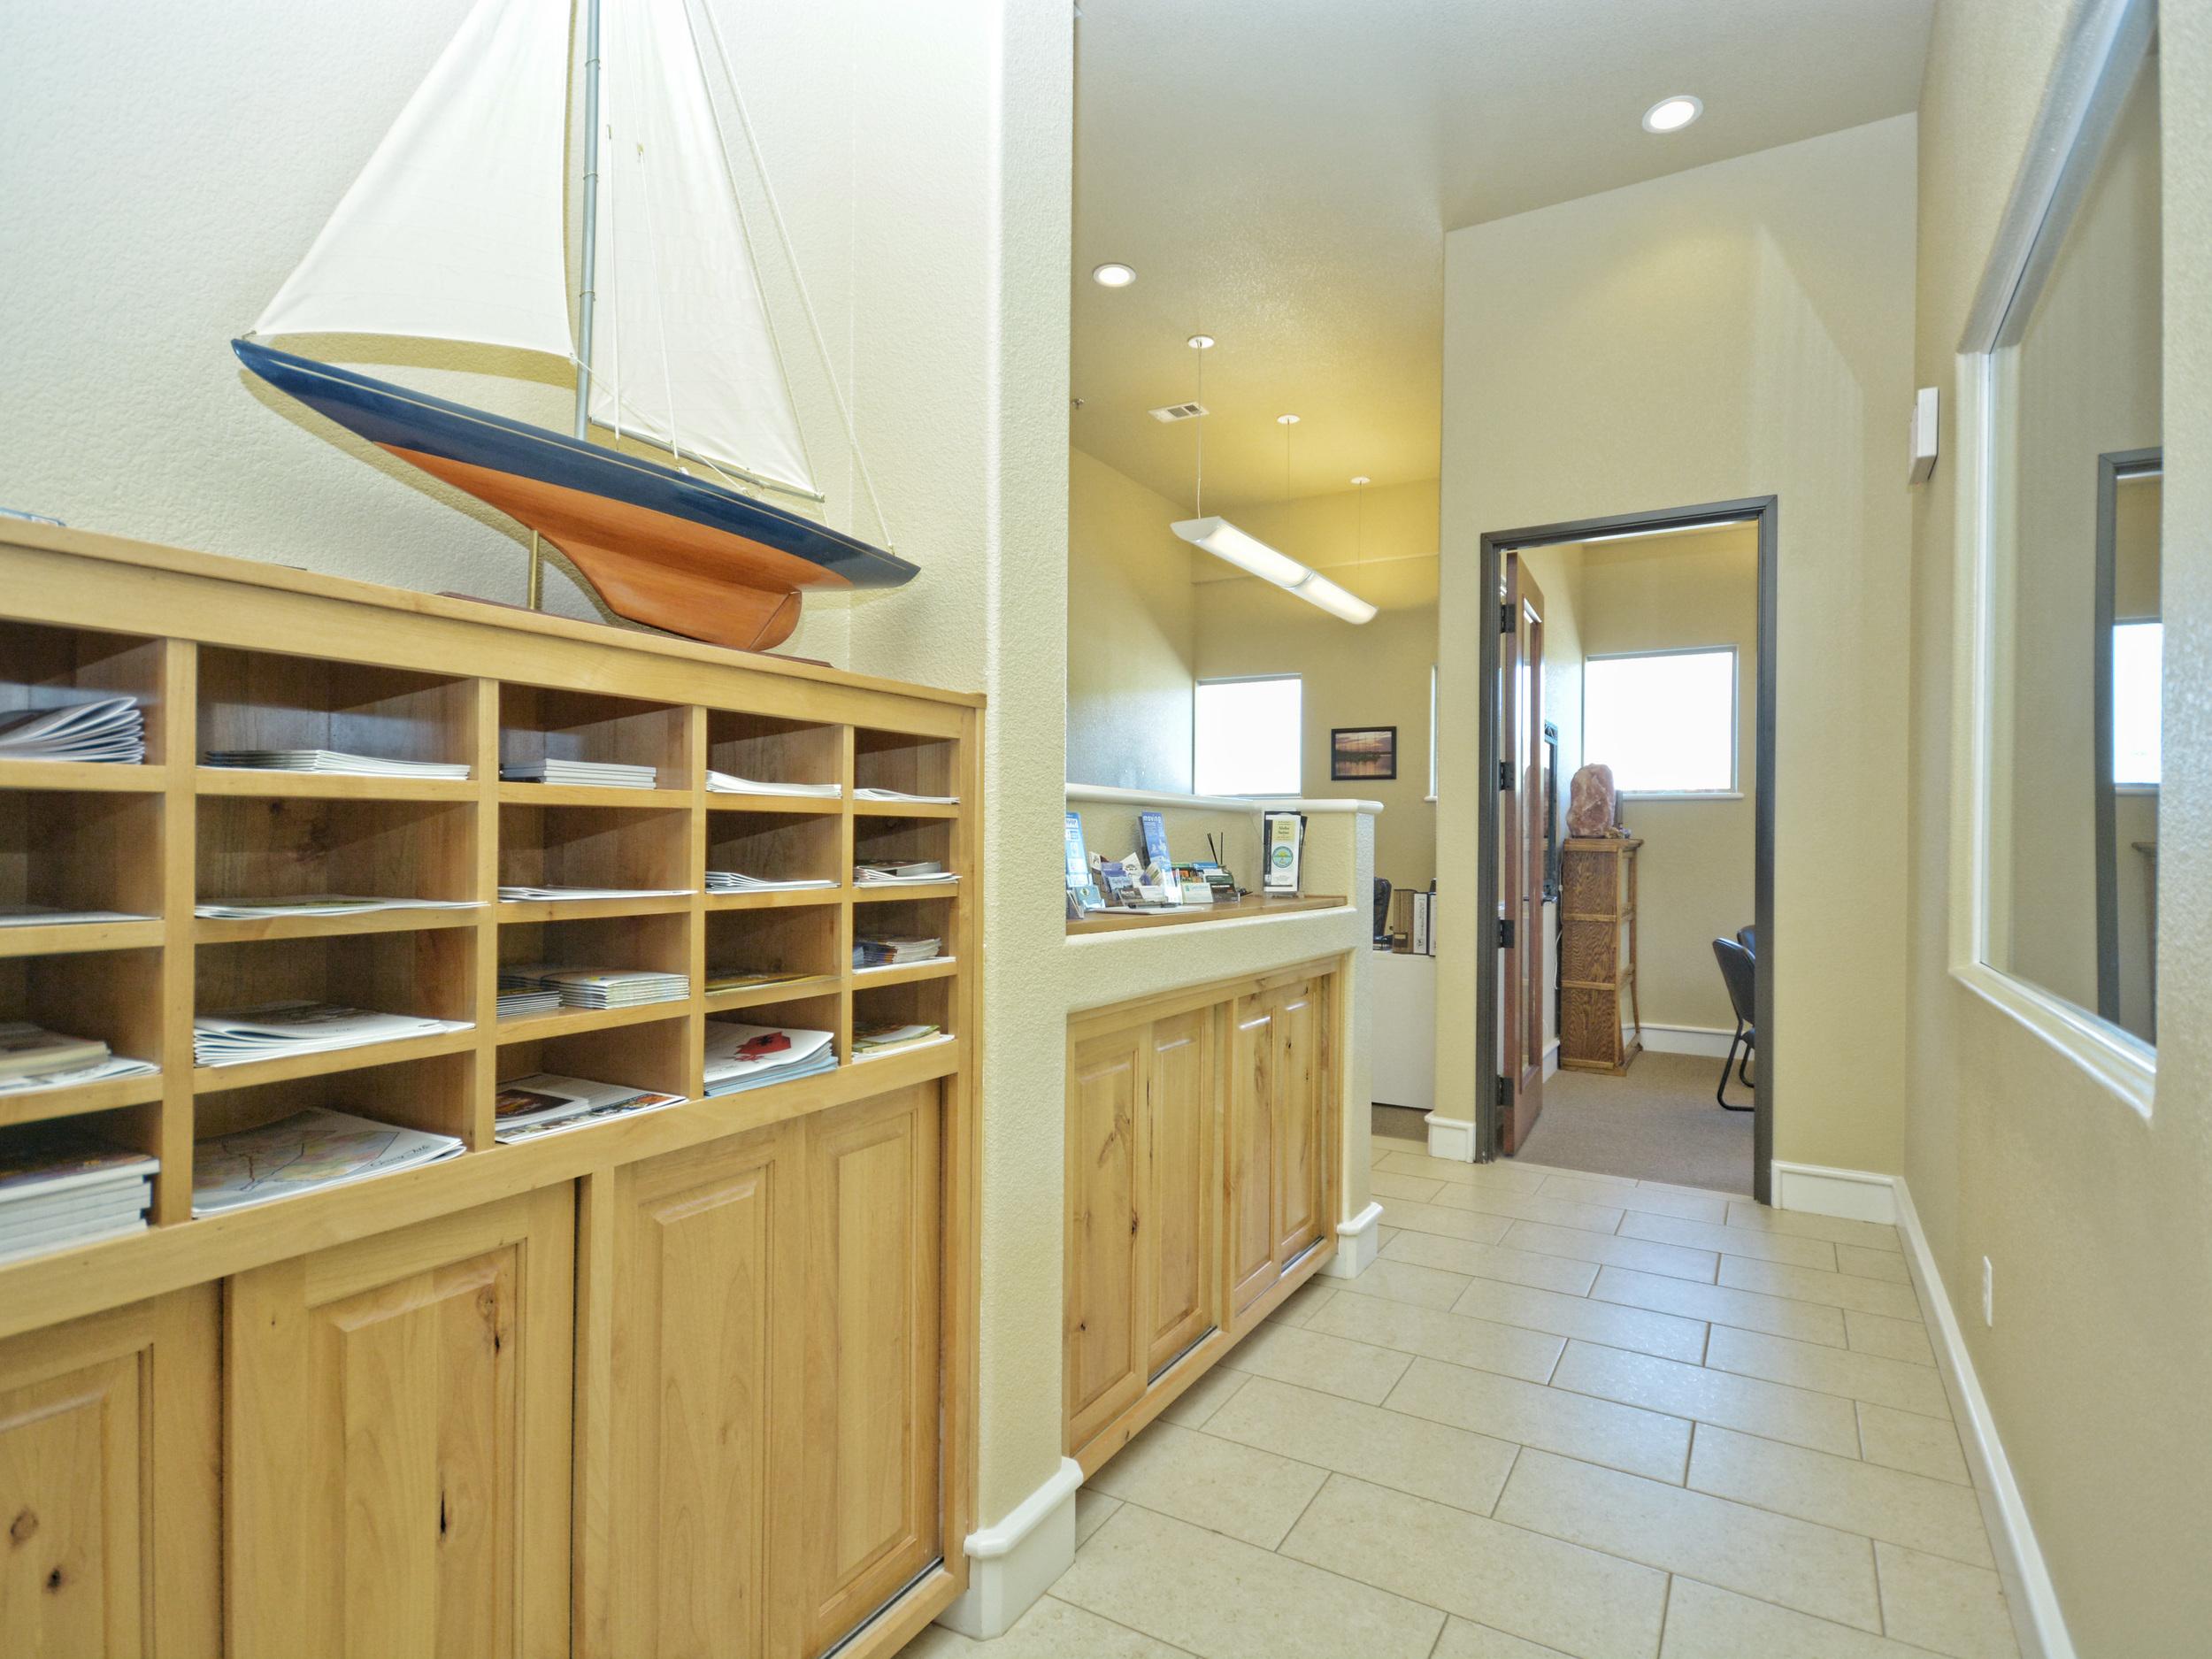 017_2nd Tenant Mail Room.jpg